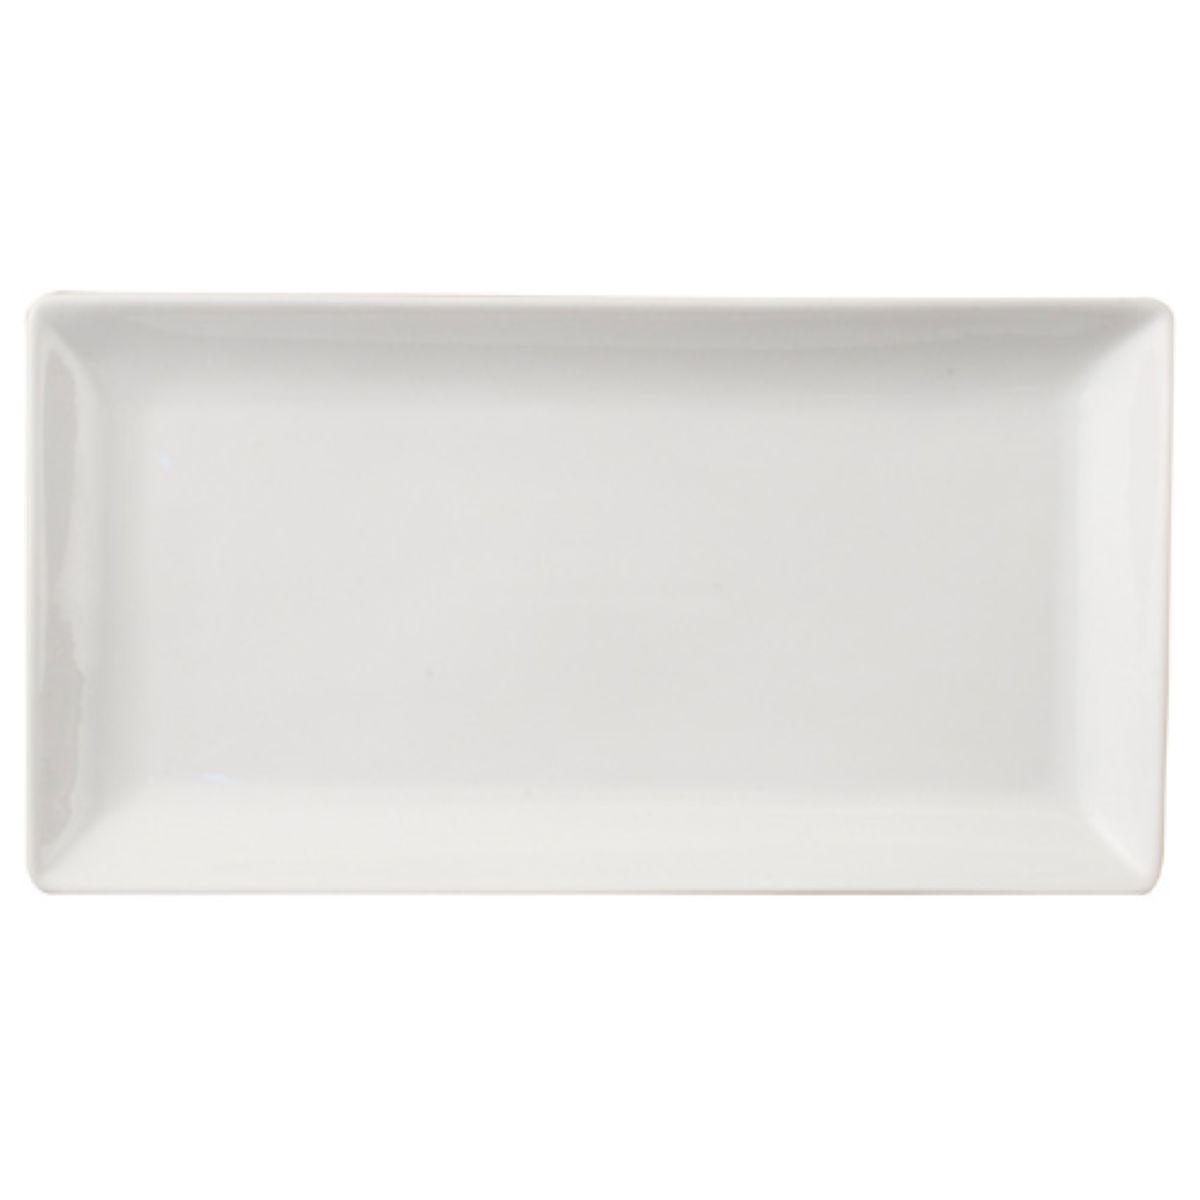 Robert Dyas Rectangular White Porcelain Plate